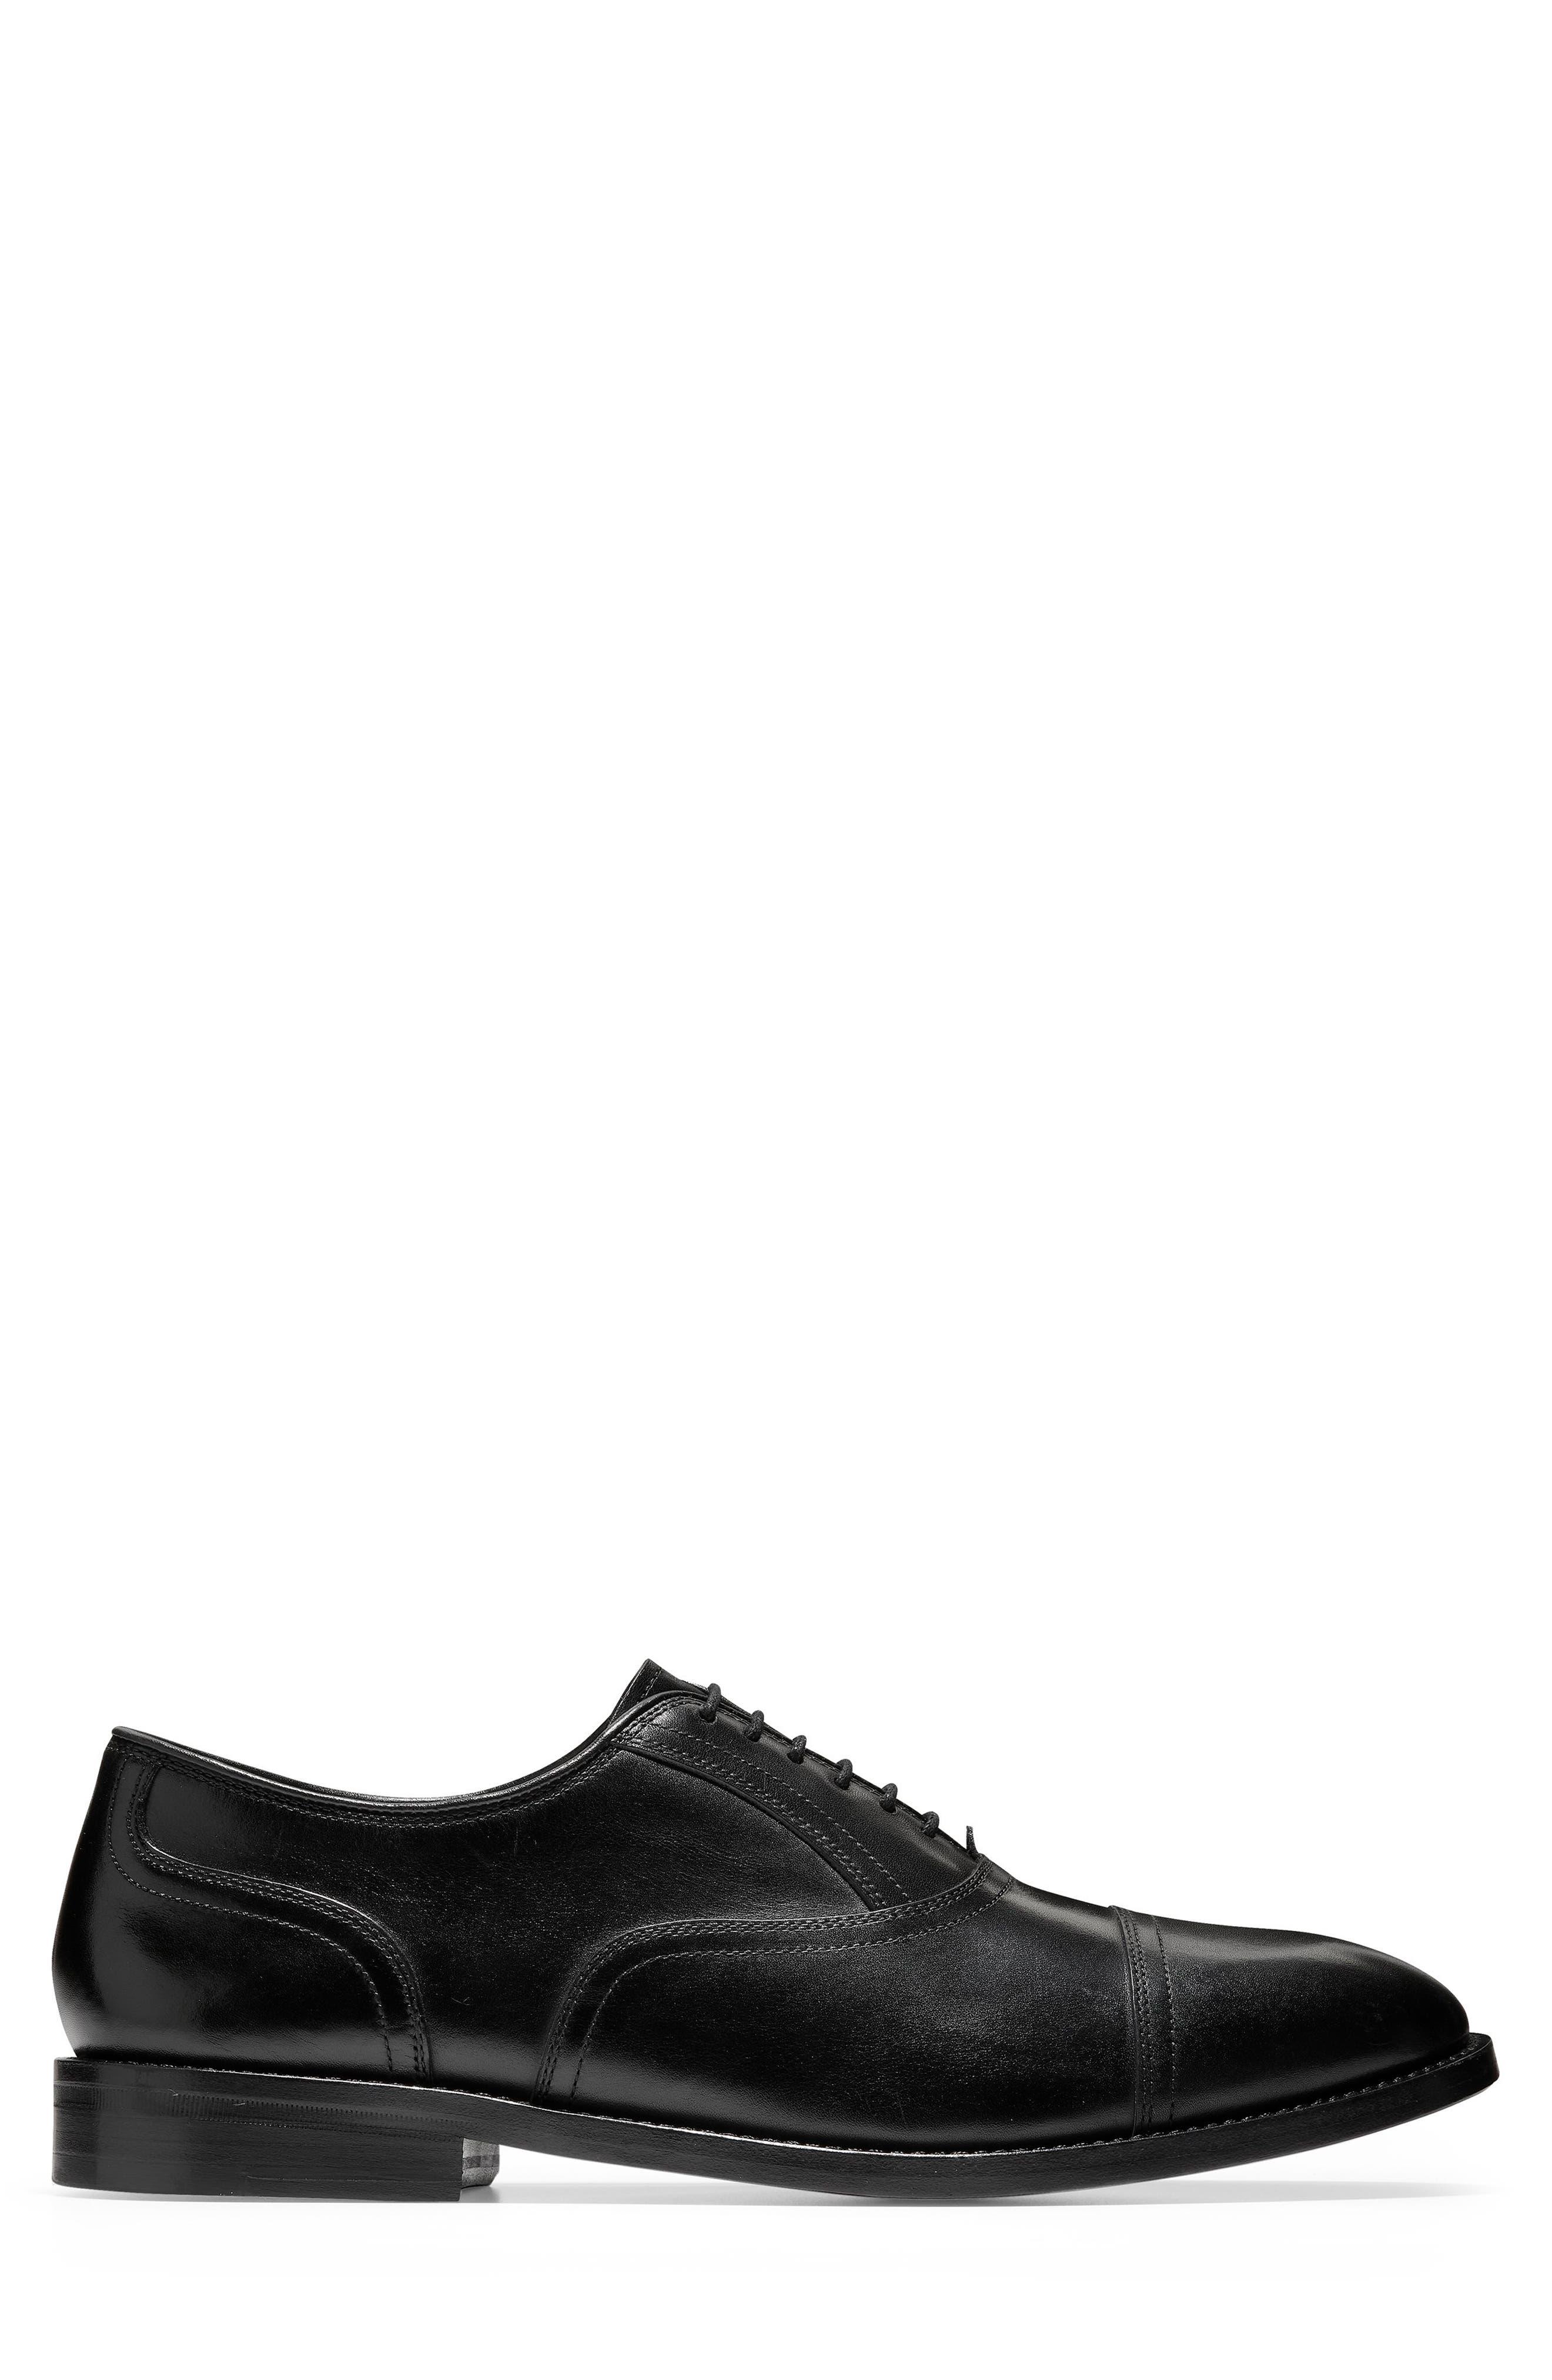 COLE HAAN, American Classics Kneeland Cap Toe Oxford, Alternate thumbnail 3, color, BLACK LEATHER